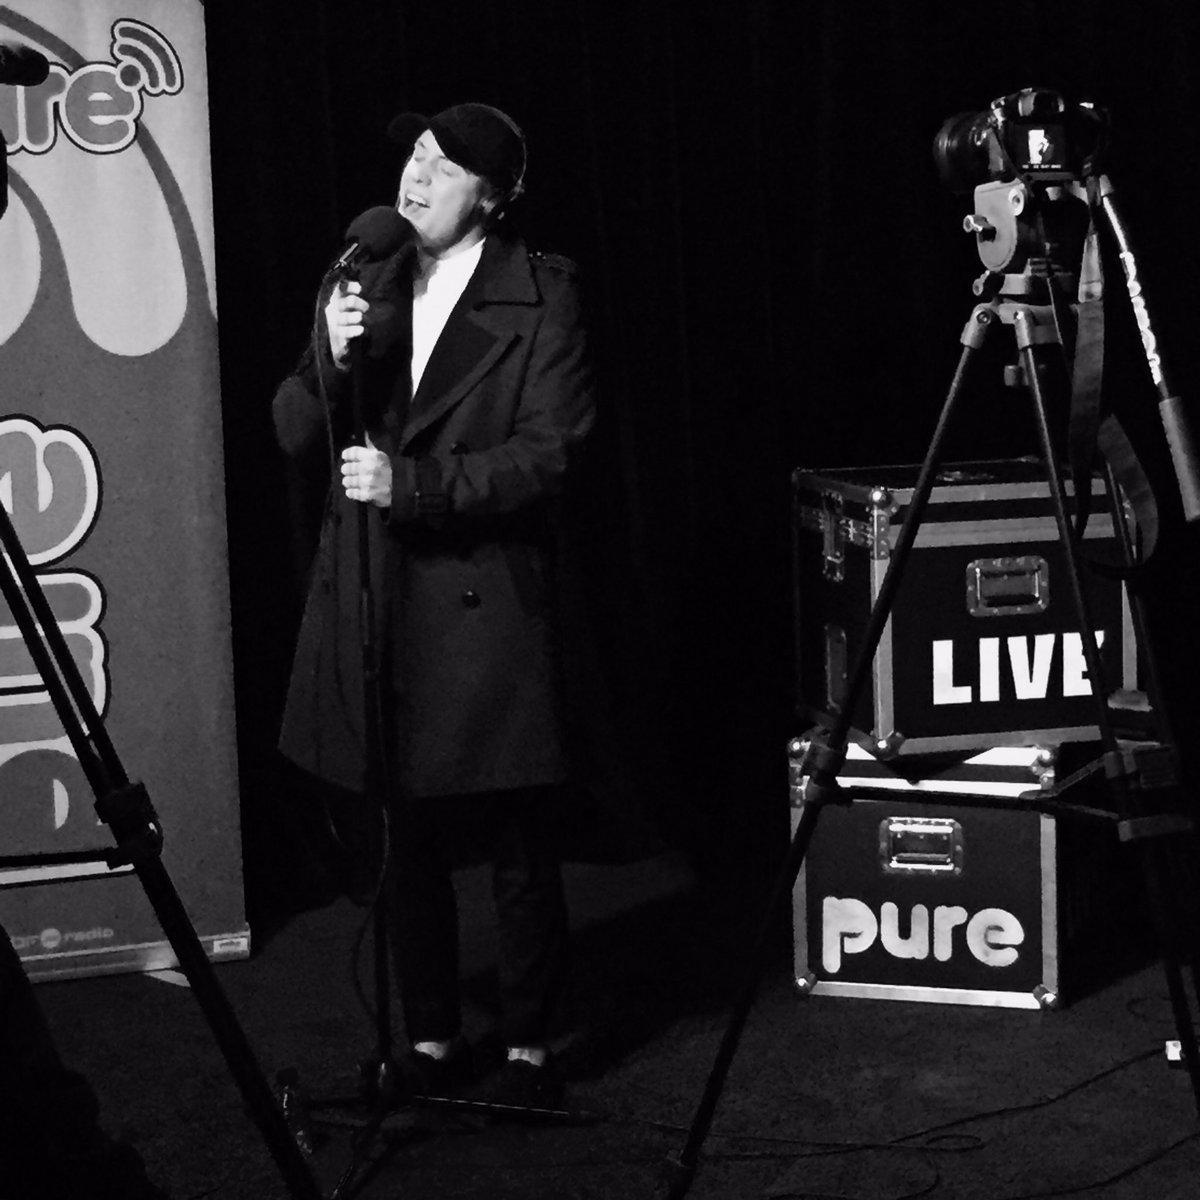 Session matinale @PureRTBF avec l&#39;incroyable @L0oiic #pure #purertbf #acousticsession #singer #loicnottet #radio #mudblood #millioneyes<br>http://pic.twitter.com/3hAjDZhBd0